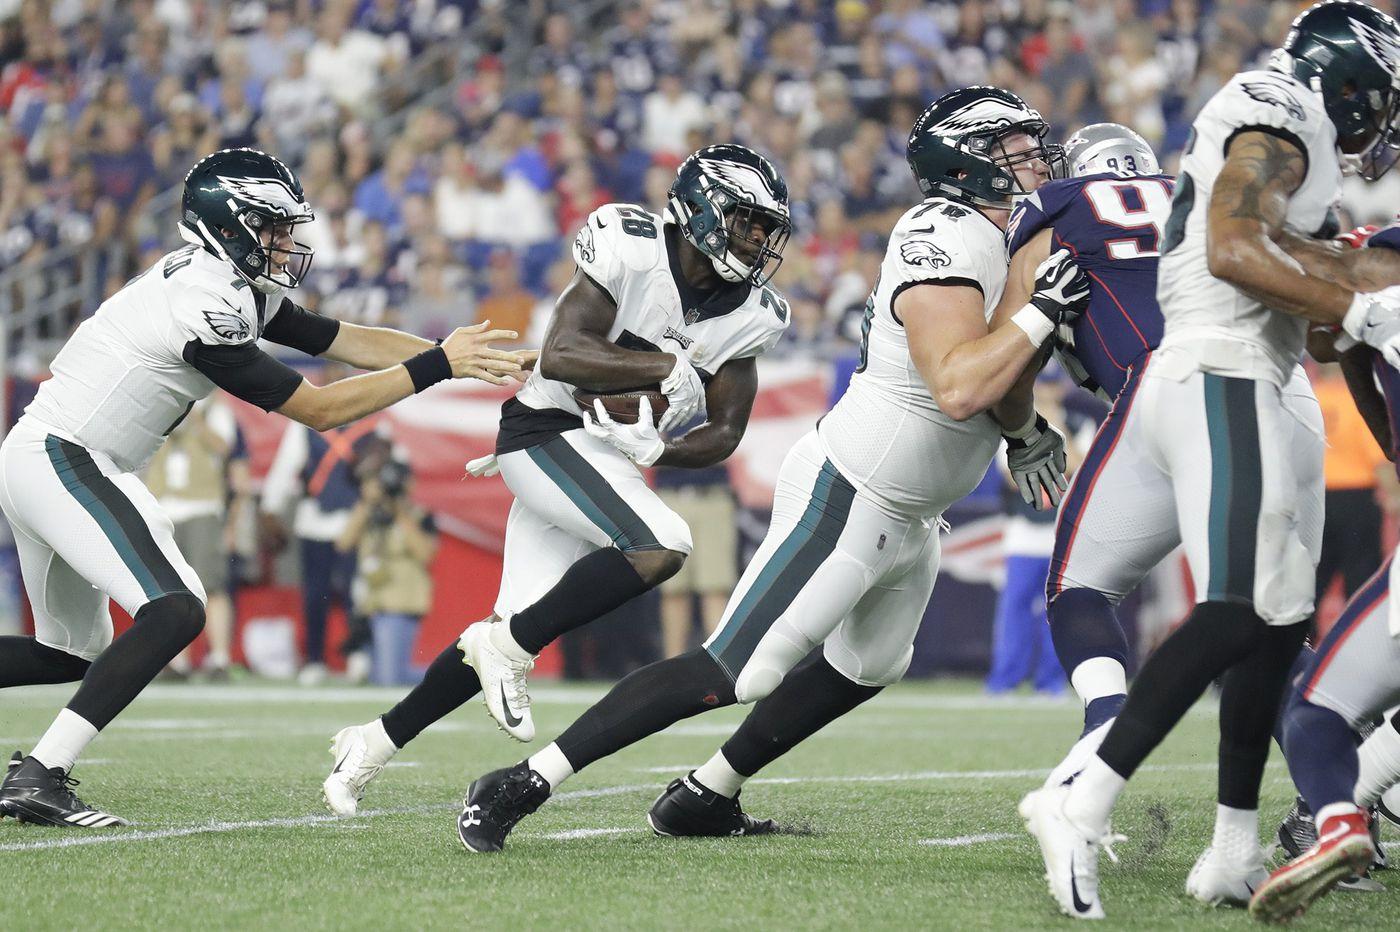 Eagles Wendell Smallwood and Matt Jones fail to gain ground in running-back battle